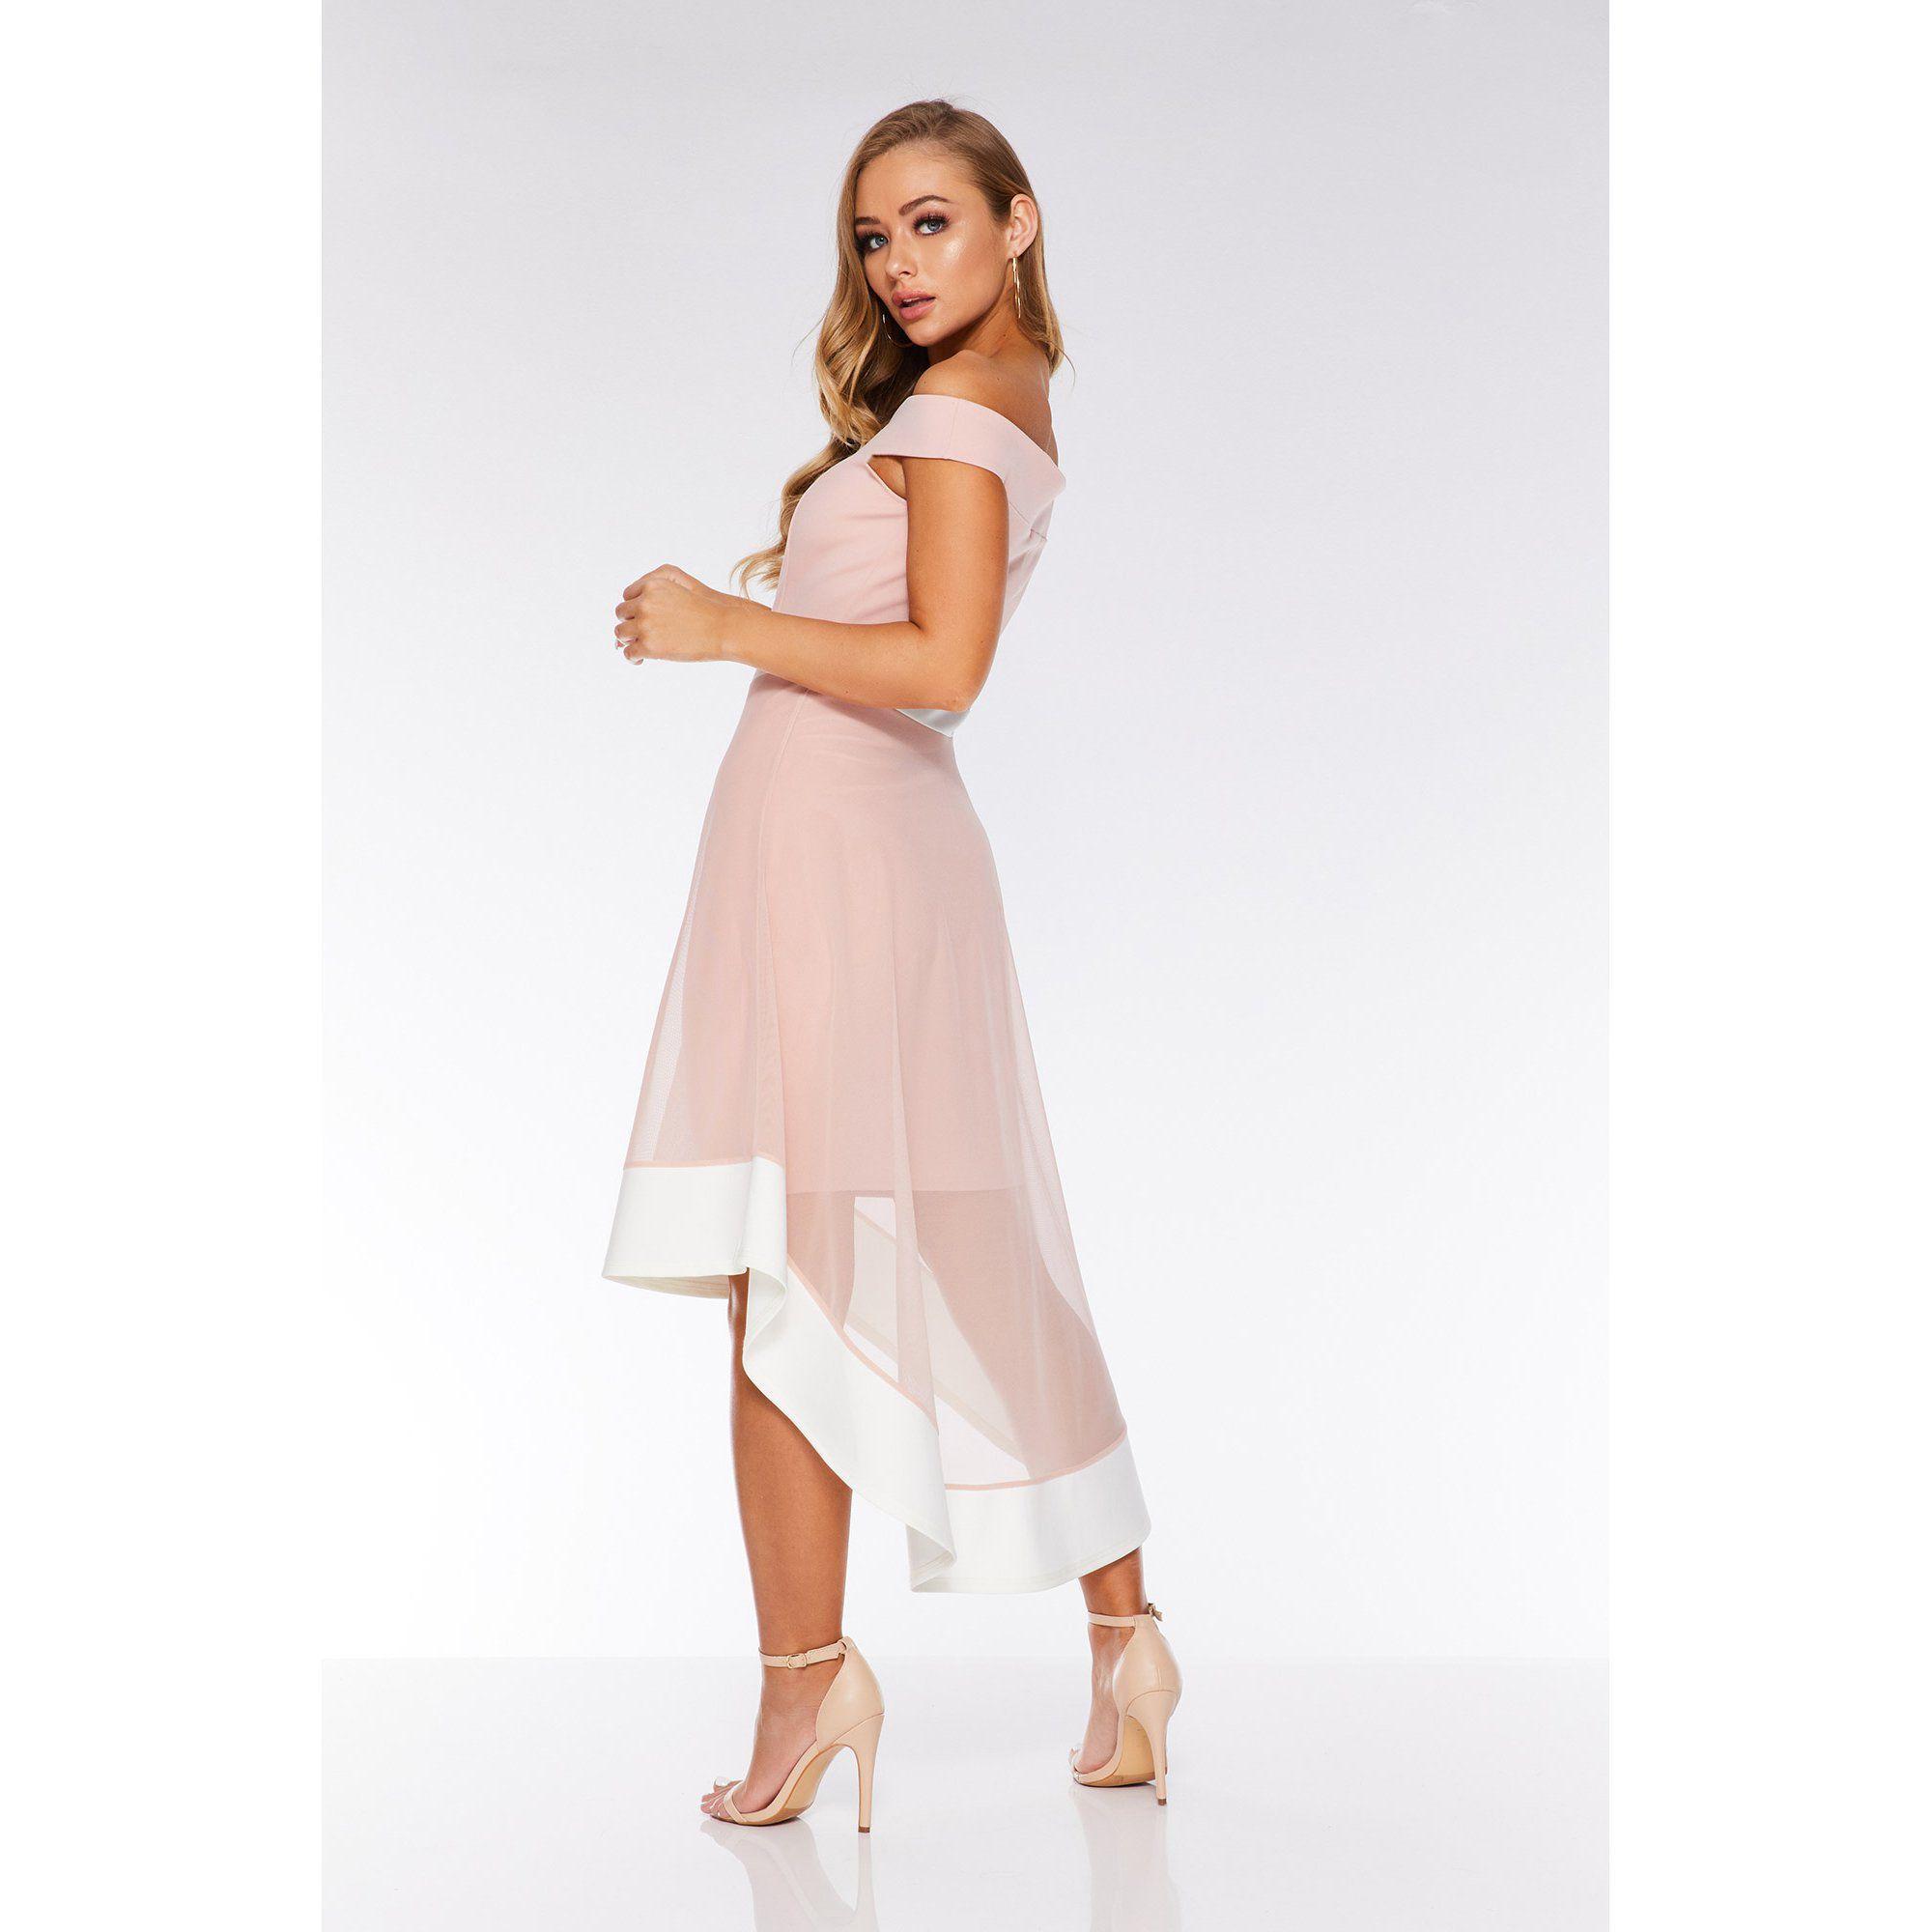 cba0bacc0d62 Quiz - Pink And Cream Bardot Mesh Dip Hem Dress - Lyst. View fullscreen